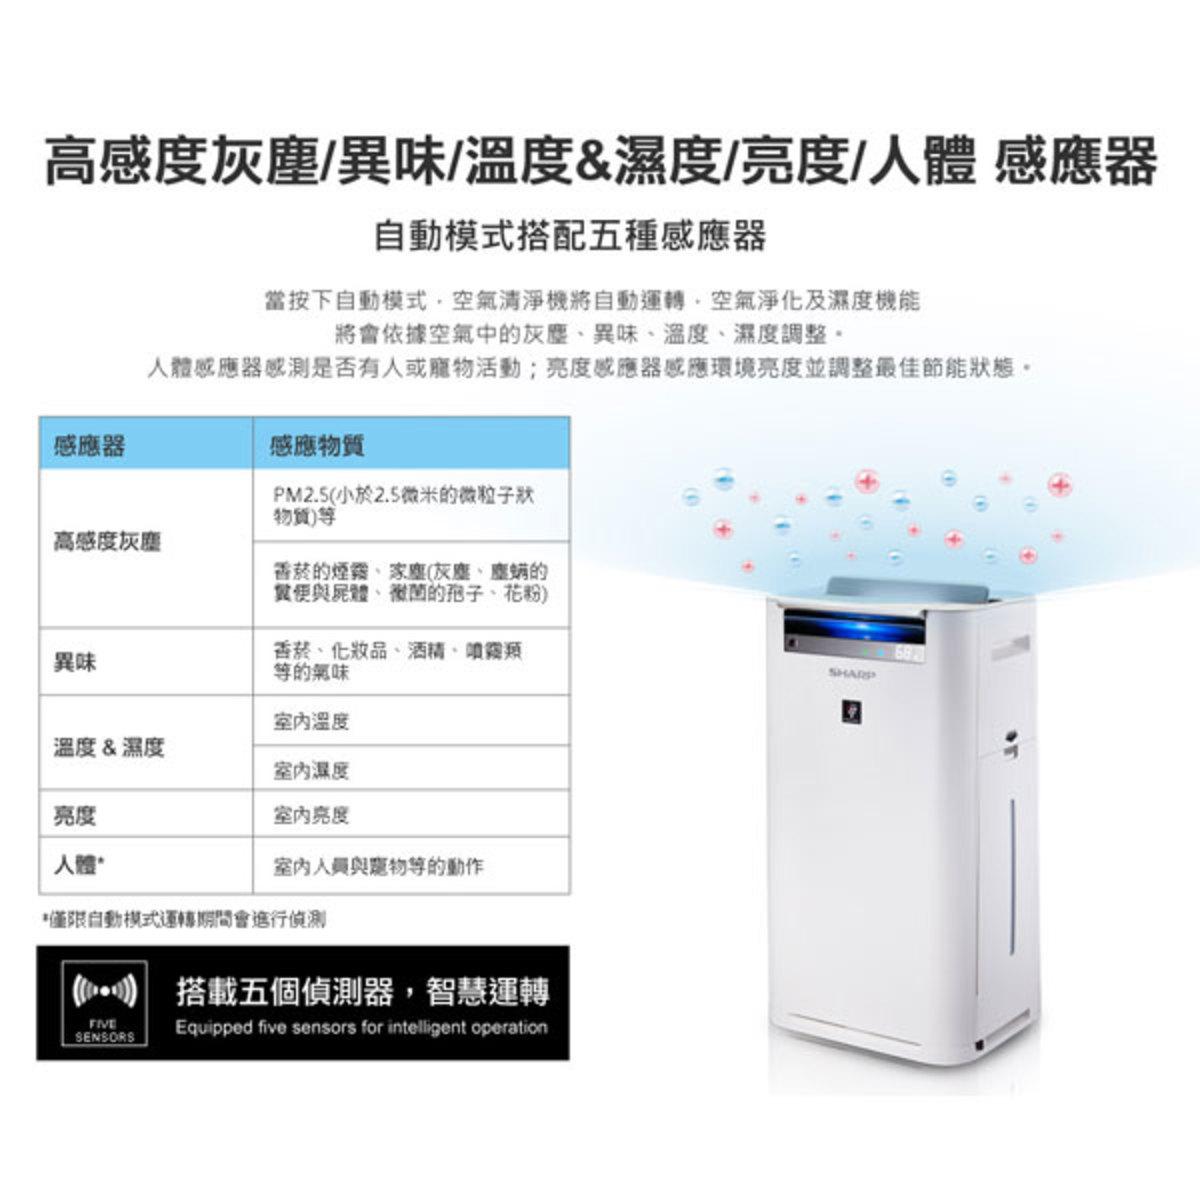 SHARP KC-JH51T 水活力增強空氣清淨機 AIoT智慧型 7000濃度自動除菌離子